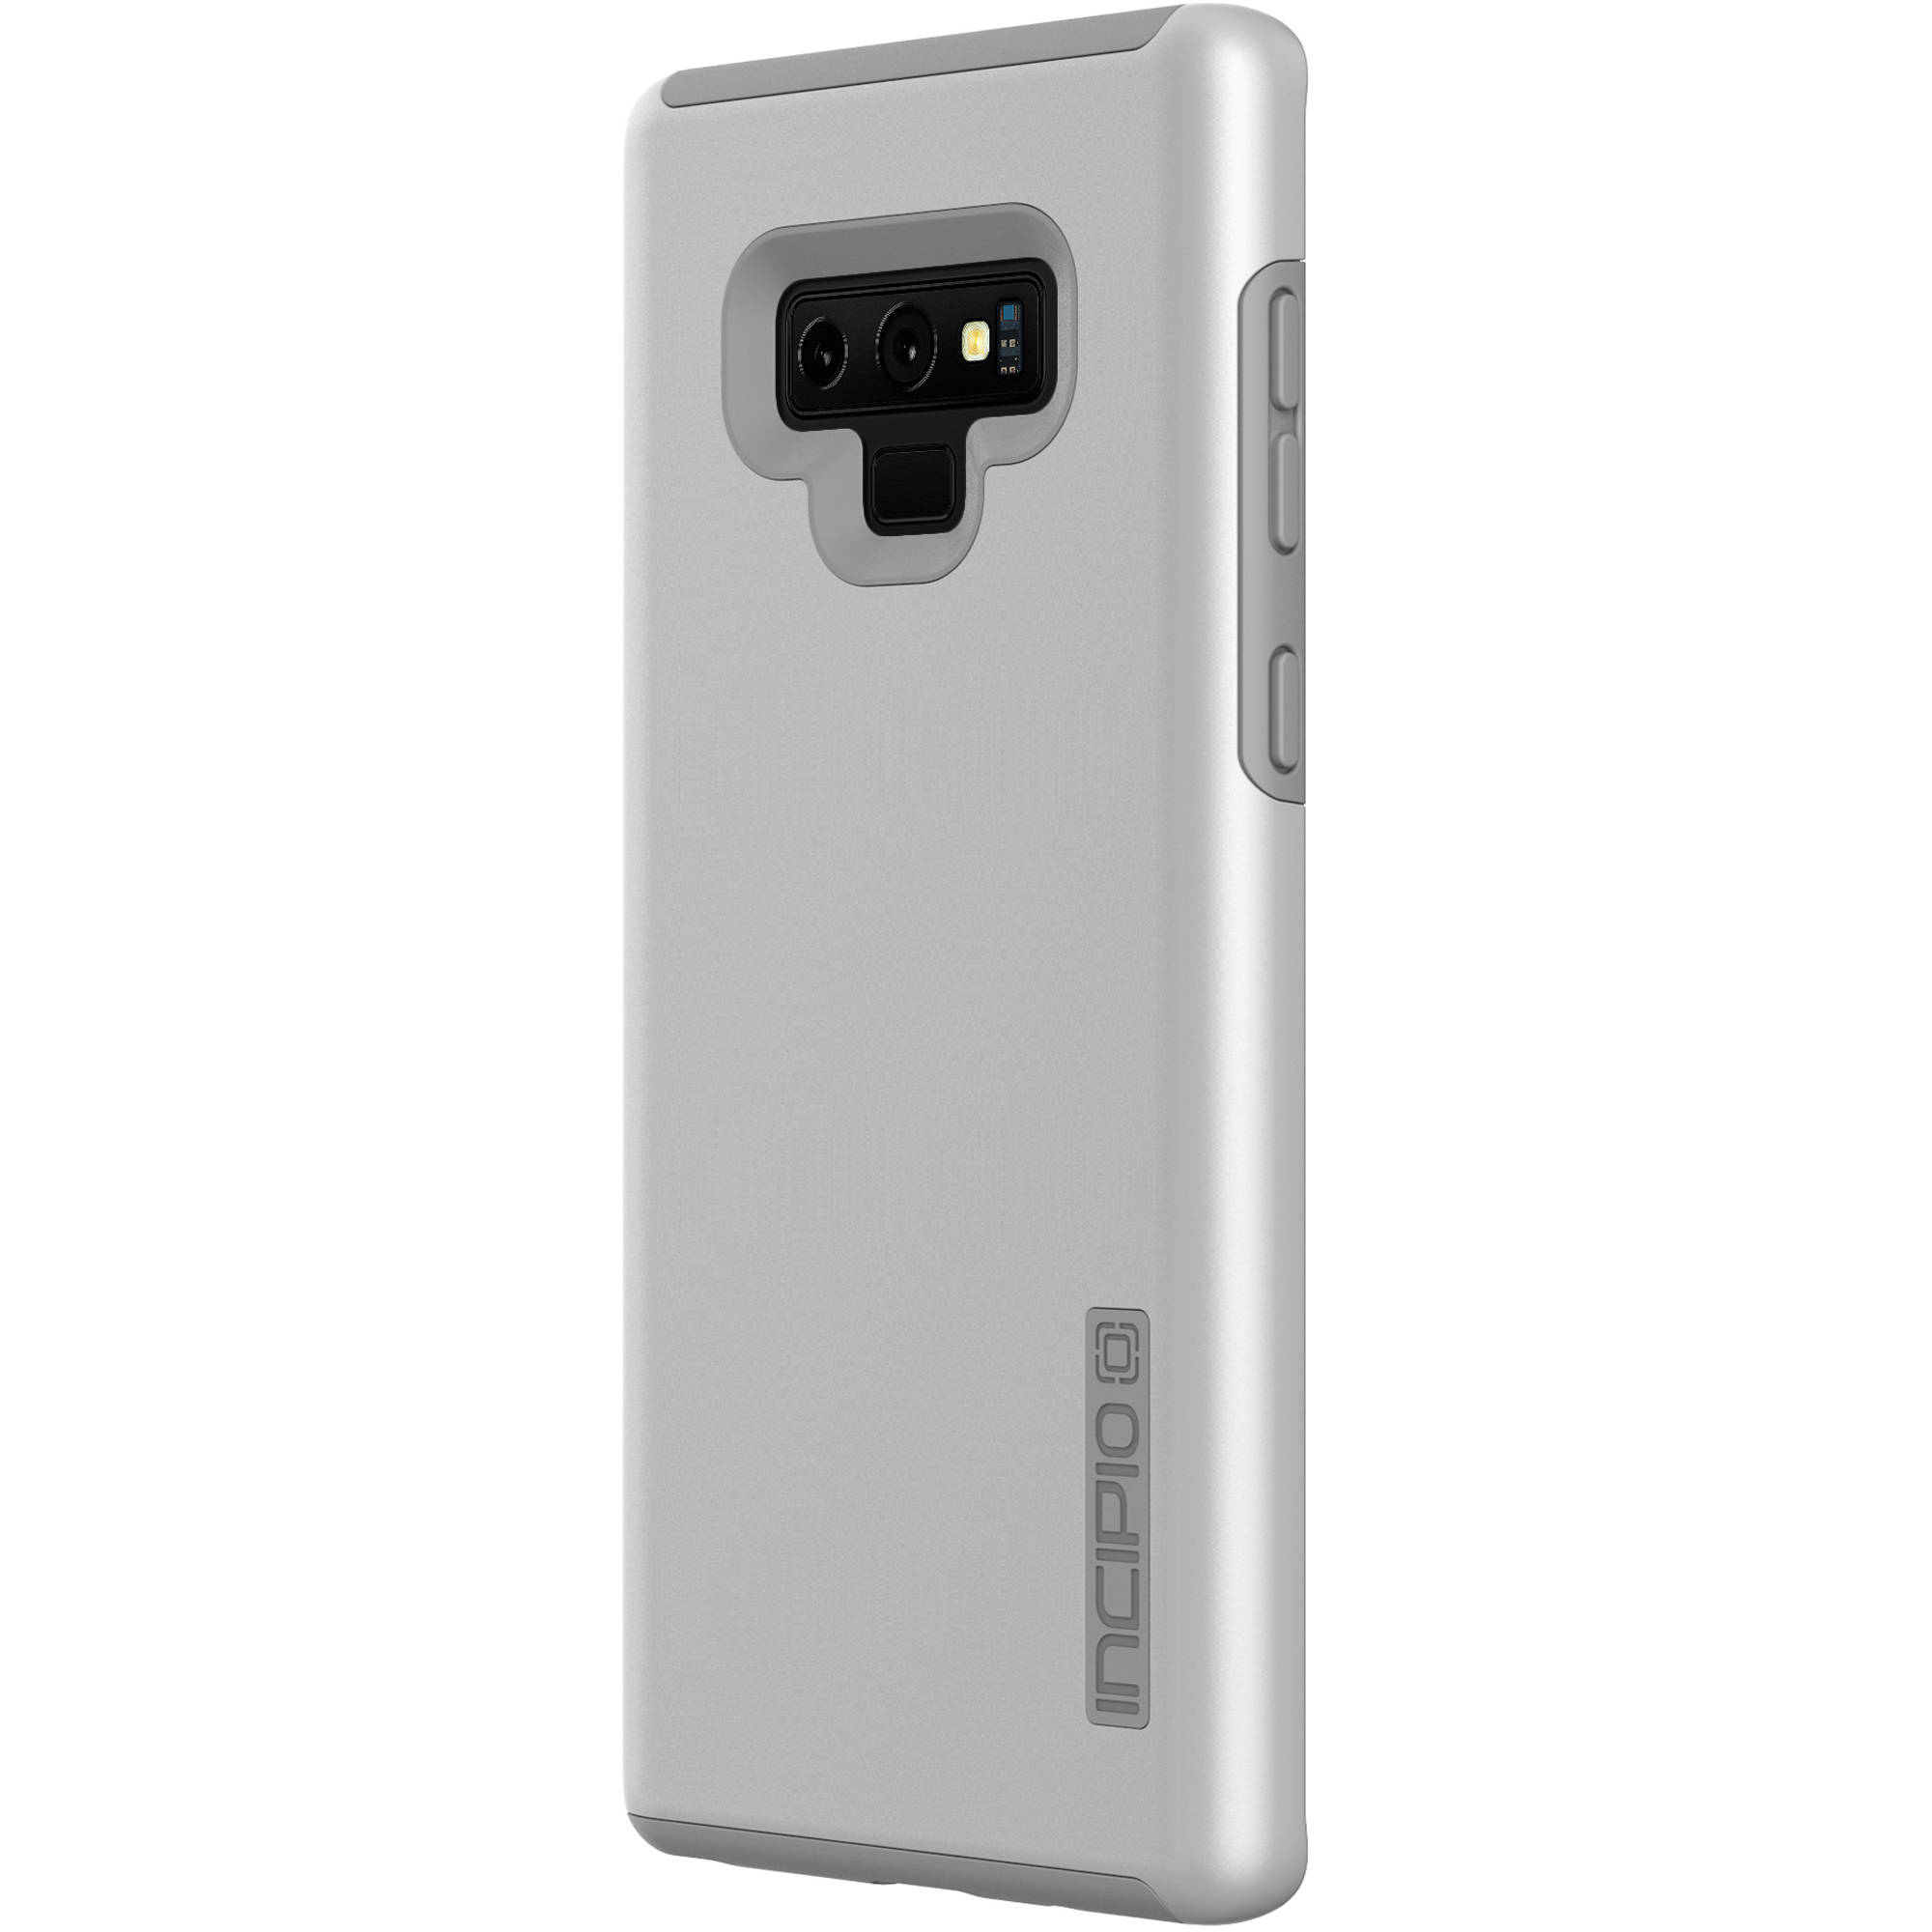 buy online ca171 07e52 Incipio DualPro Case for Samsung Galaxy Note9 (Iridescent Gray/Gray)